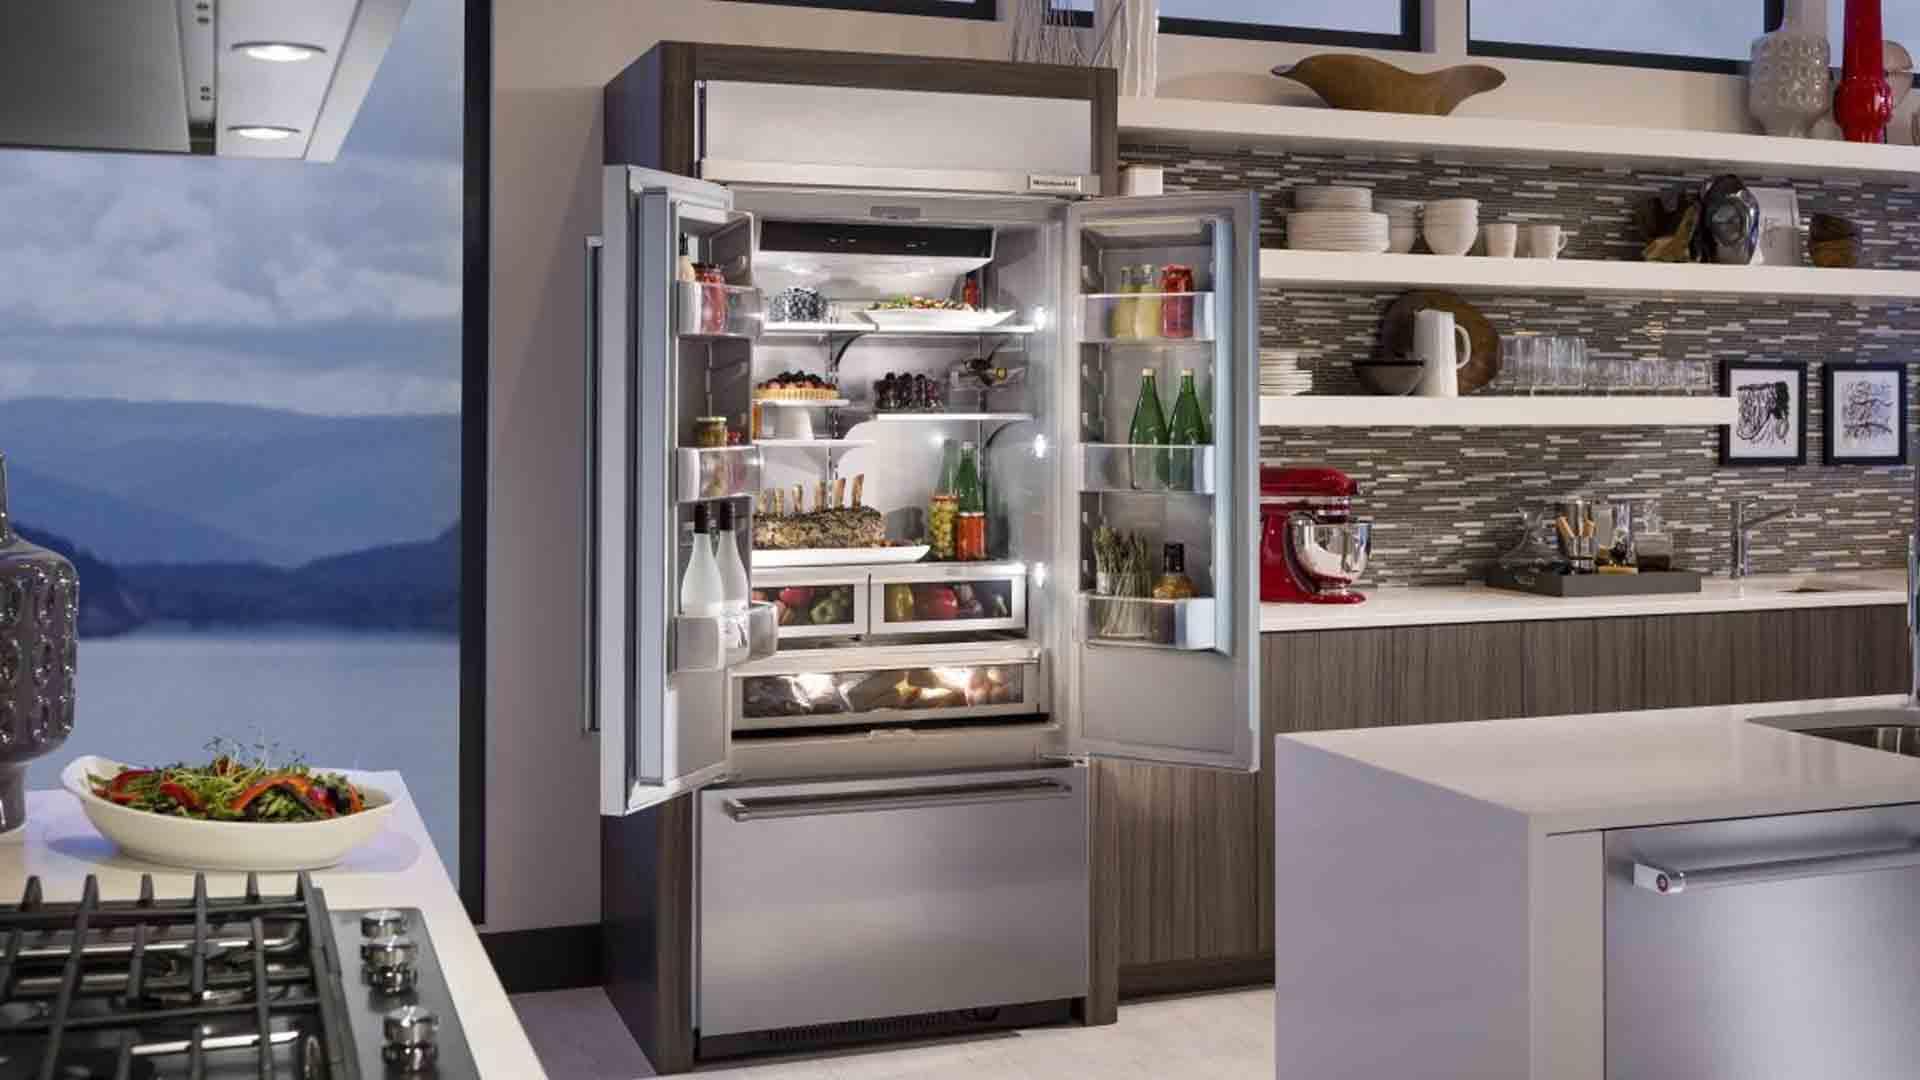 KitchenAid Built-In Refrigerator Repair | KitchenAid Repairs